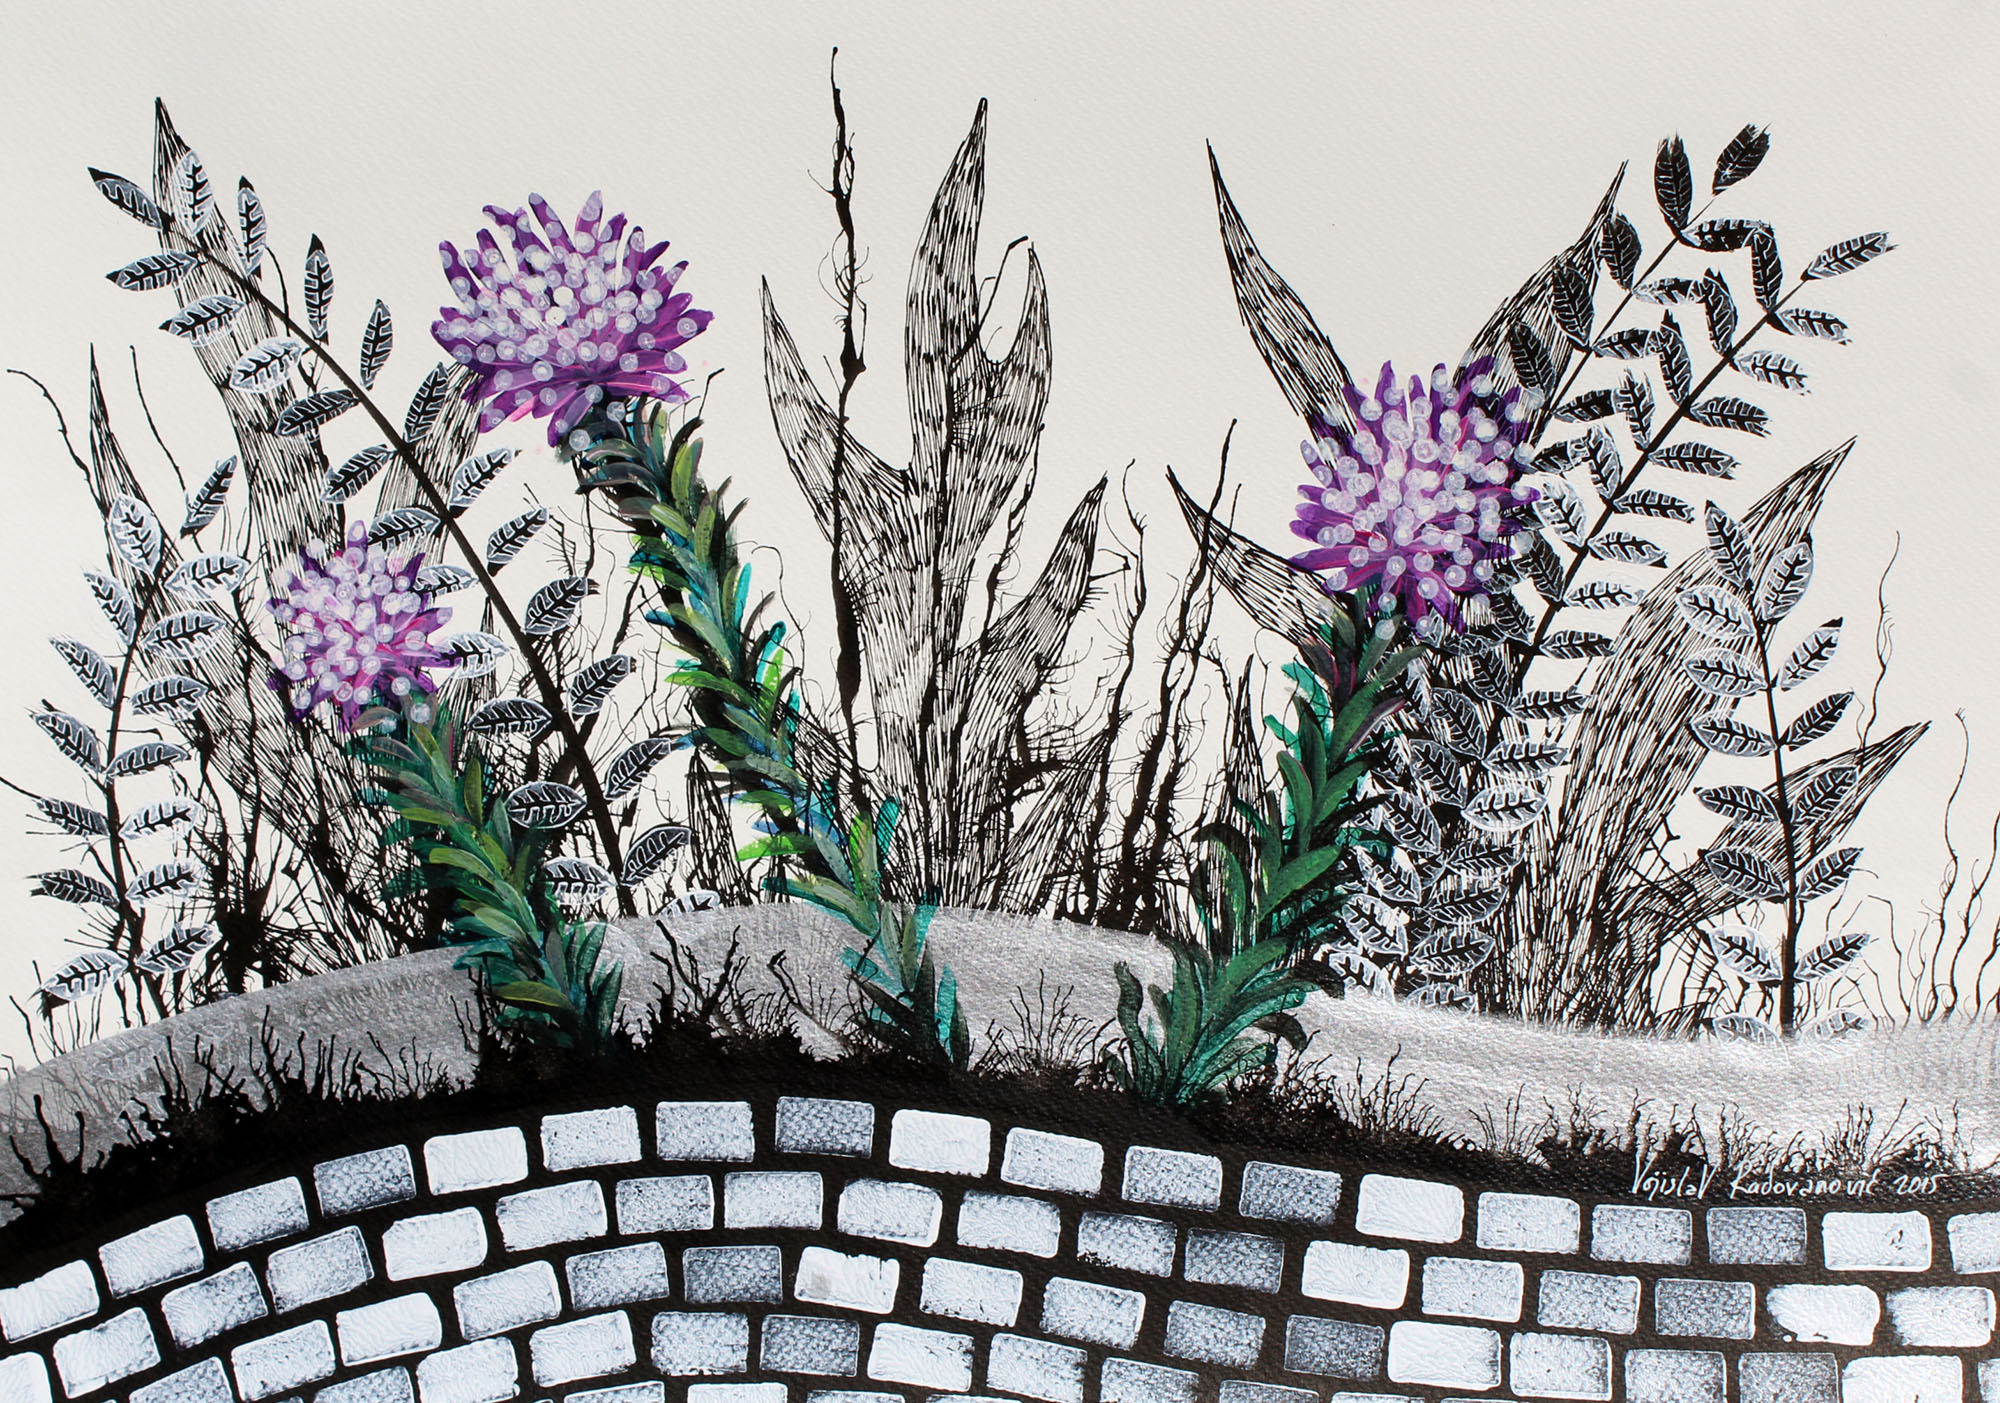 VOJISLAV RADOVANOVIC, Flowers